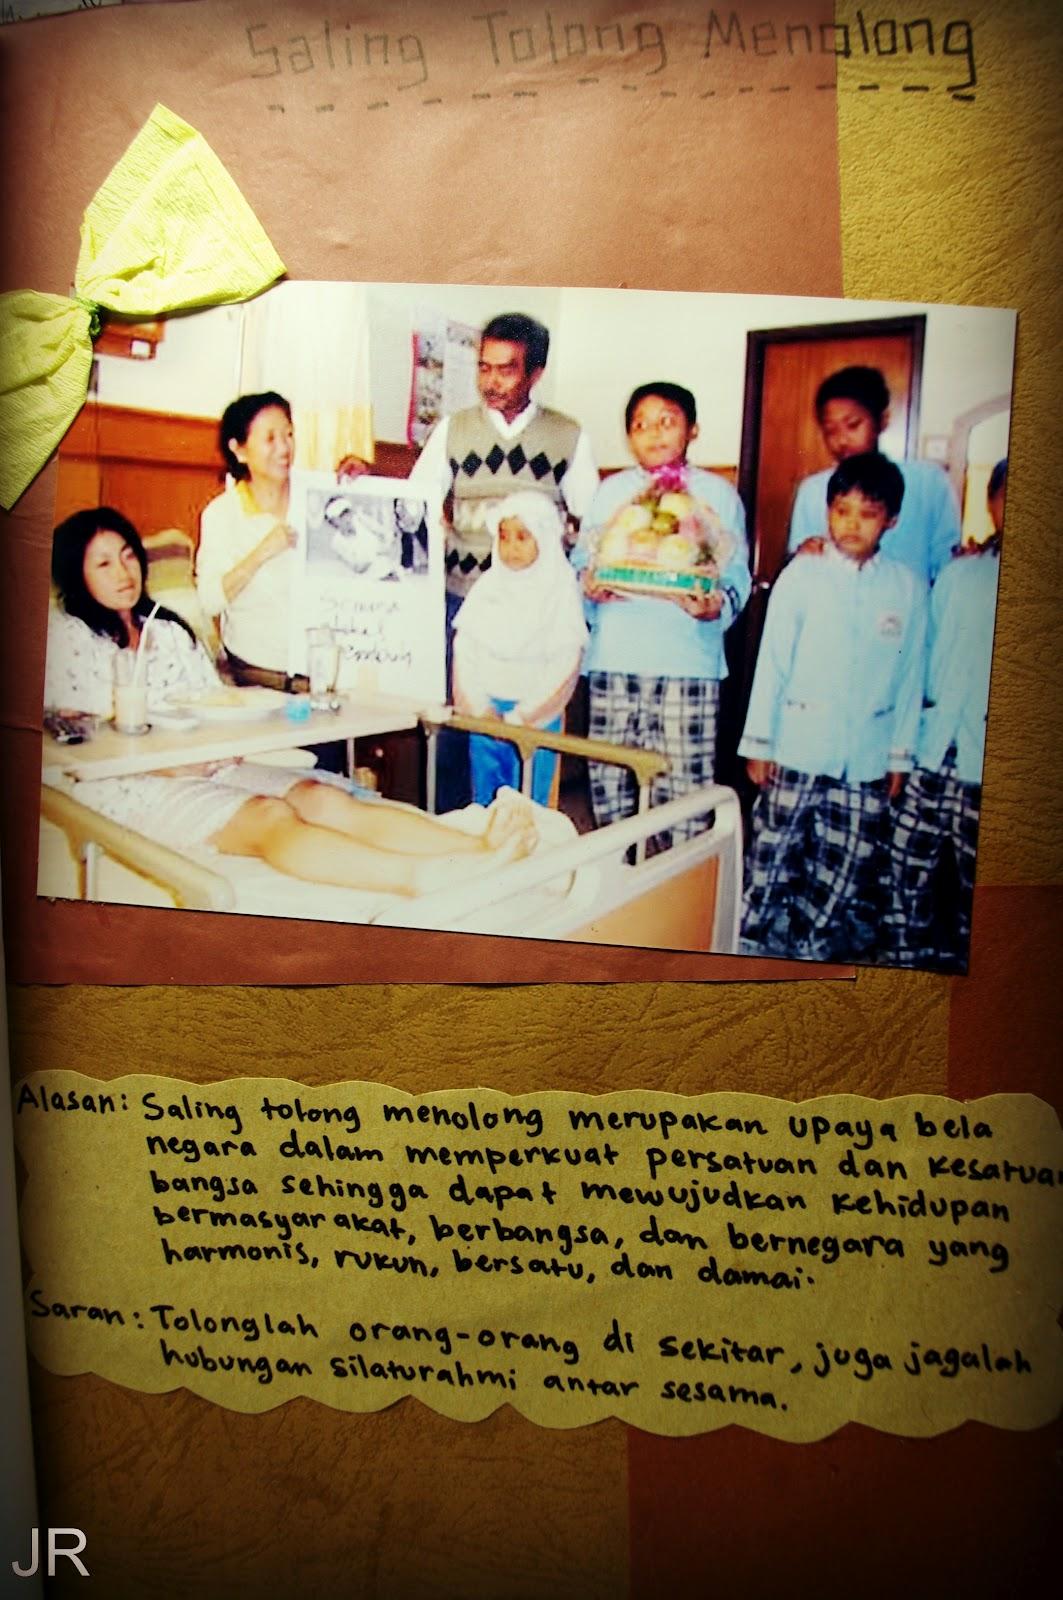 jayanti u0026 39 s learning diary  bela negara